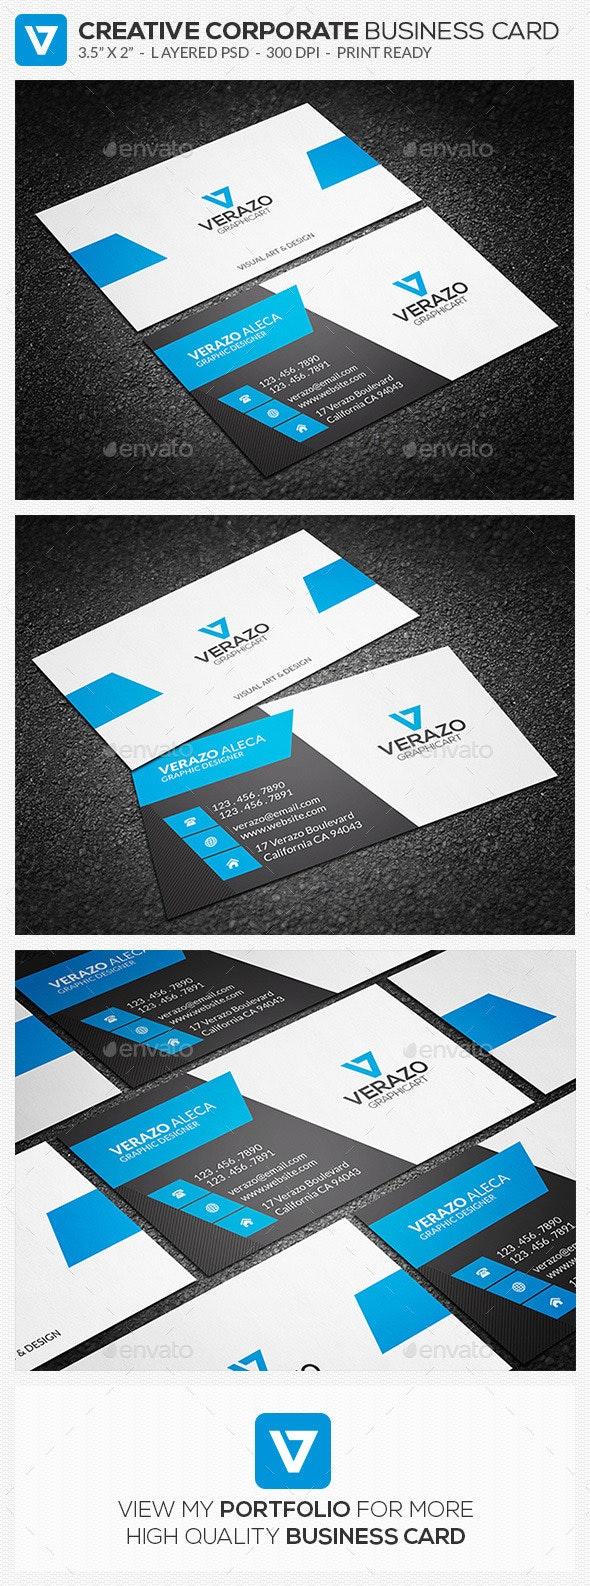 Creative Corporate Business Card 60 - Corporate Business Cards